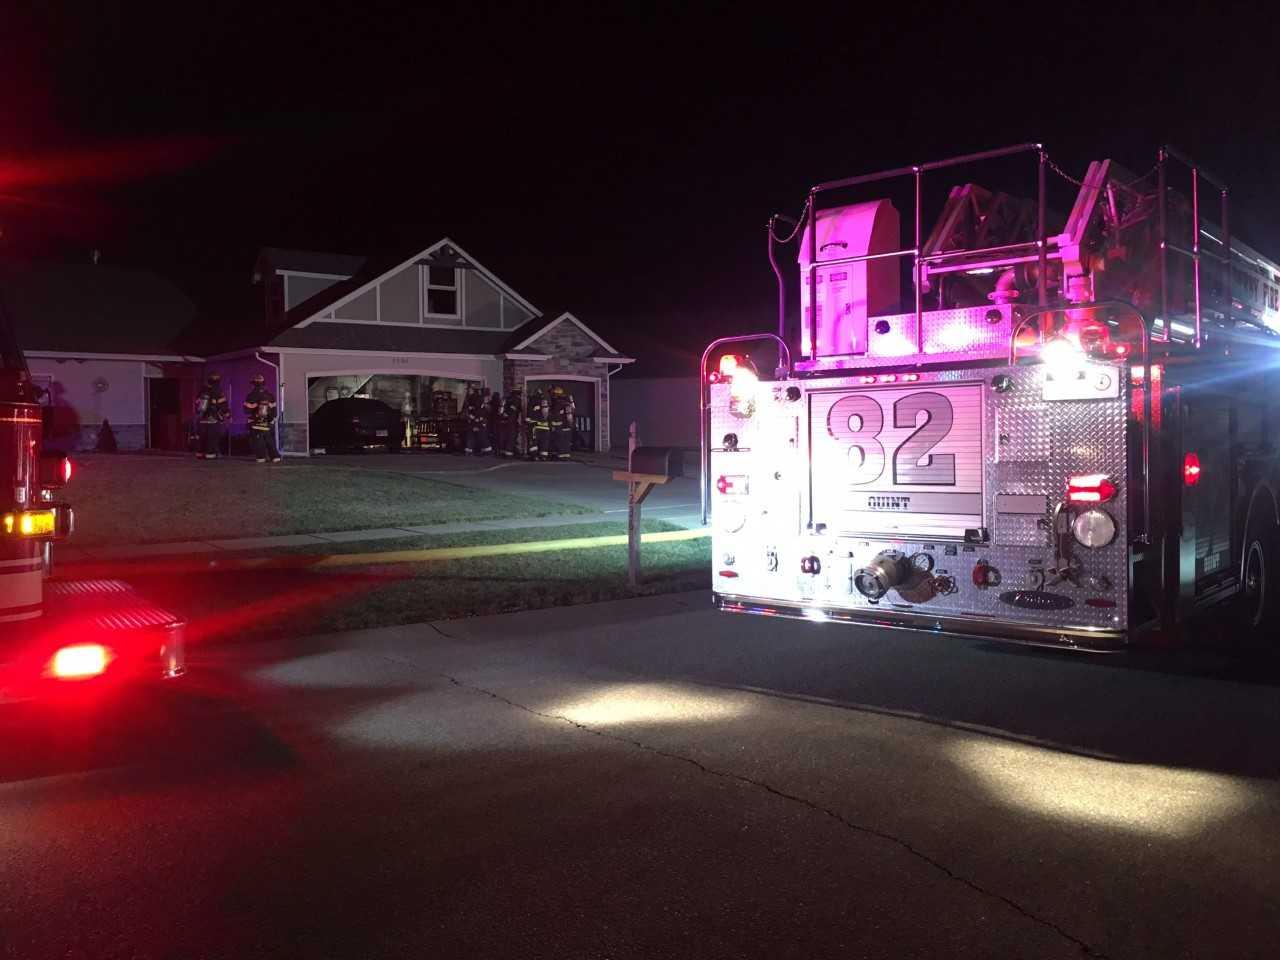 derby house fire 040818_1523204623395.jpg.jpg